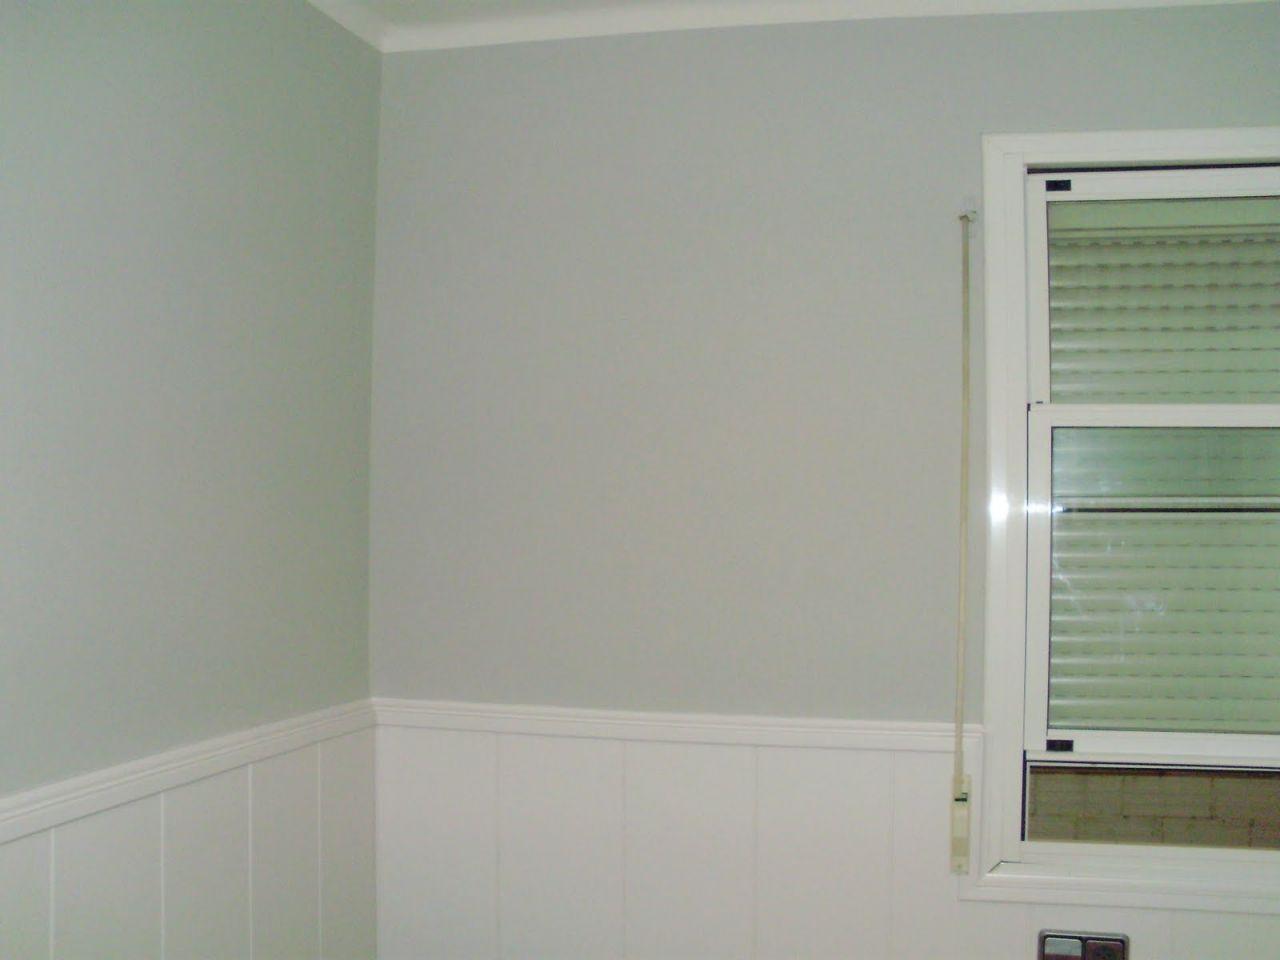 Molduras de madera para pared habitacion ni os buscar for Molduras de madera para pared